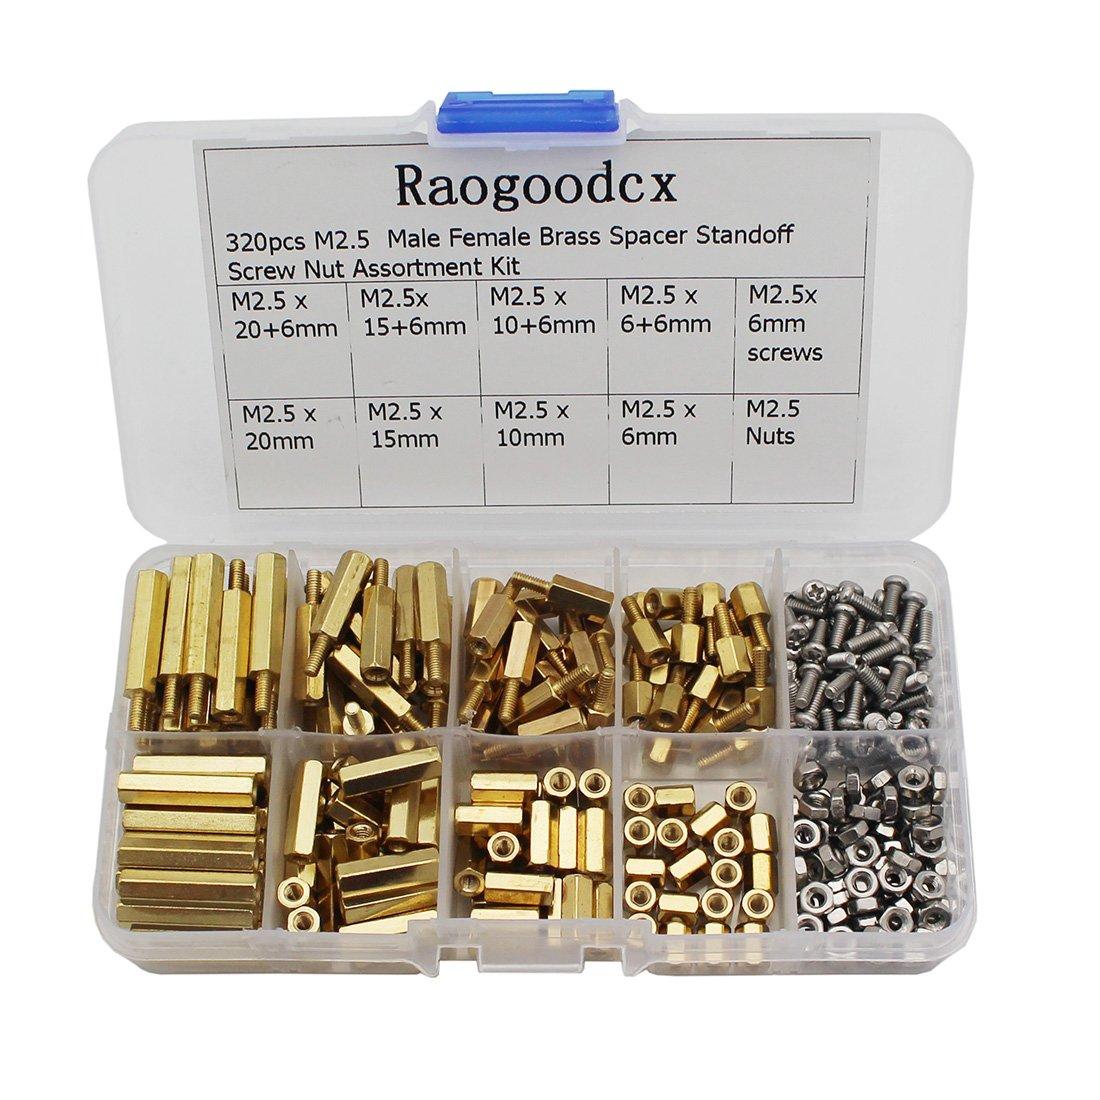 Raogoodcx 320Pcs M2.5 Male Female Brass Spacer Standoff Screw 6mm 10mm 15mm 20mm Nut Assortment Kit Raogoodcx® NUT-BM2.5